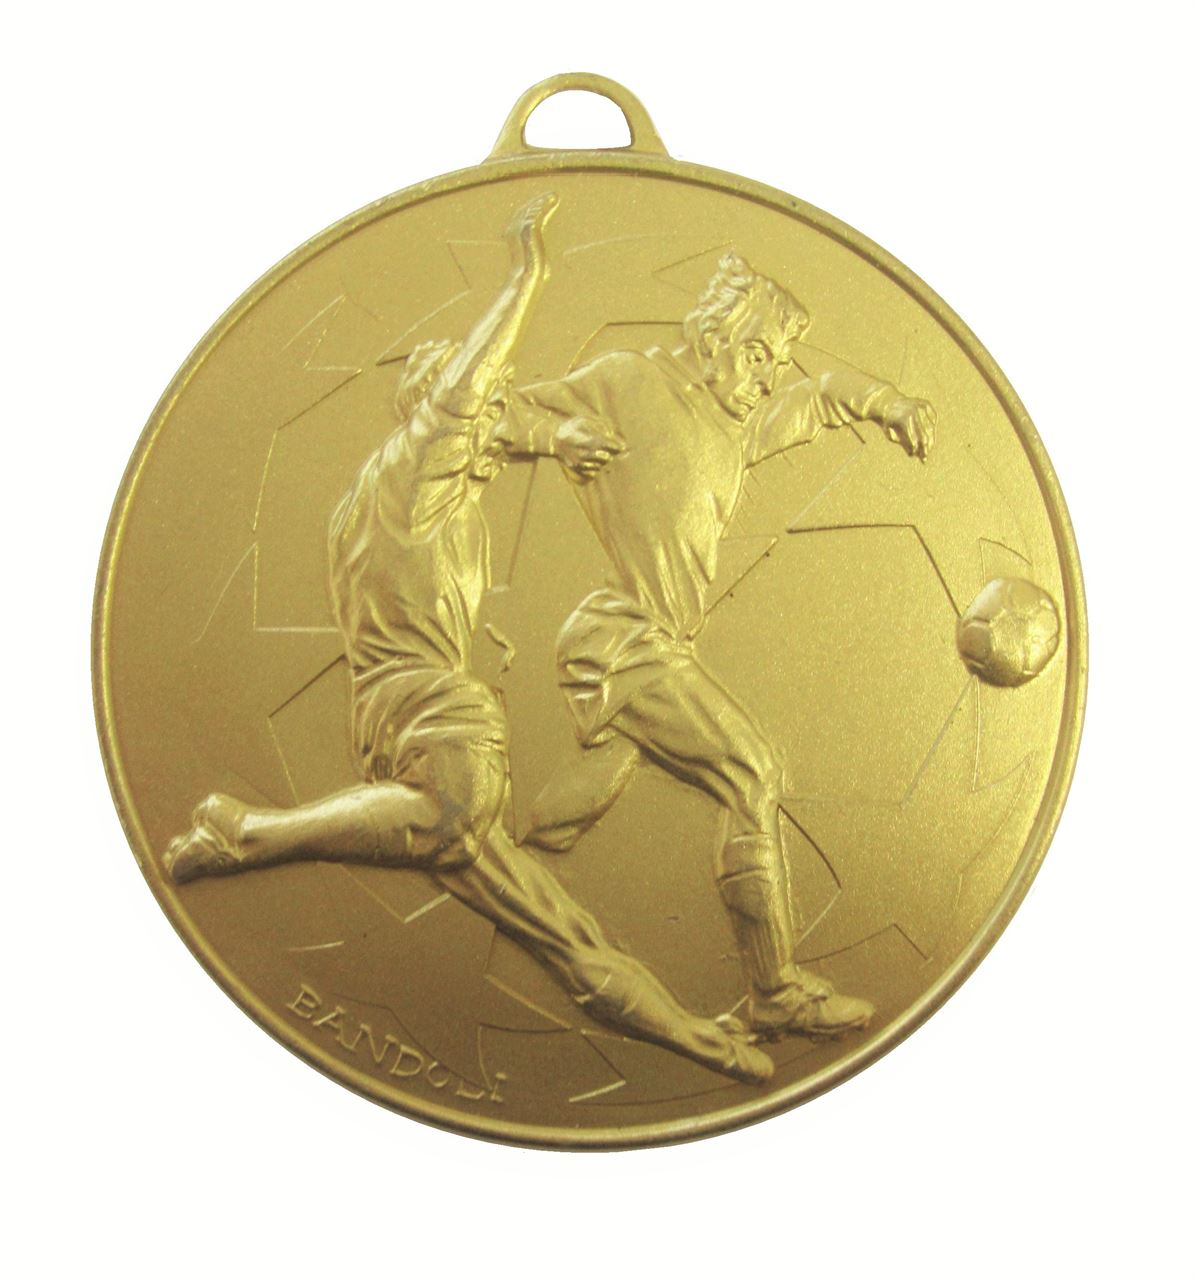 Gold Economy Football Stars Medal (size: 50mm) - 437E